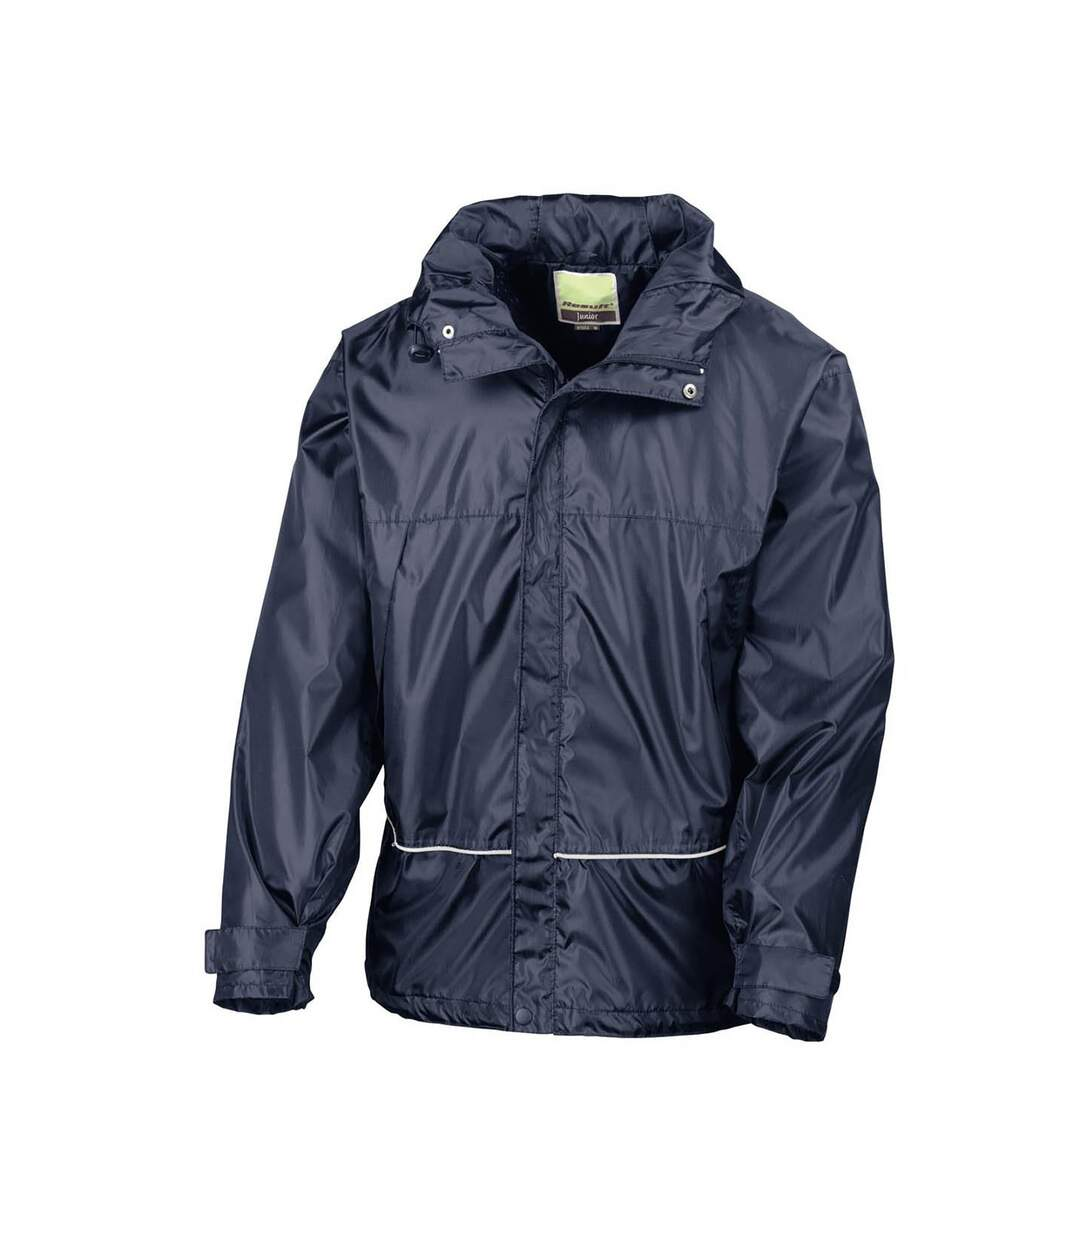 Result Mens Waterproof Windproof 2000 Coach Jacket (Navy Blue) - UTBC880